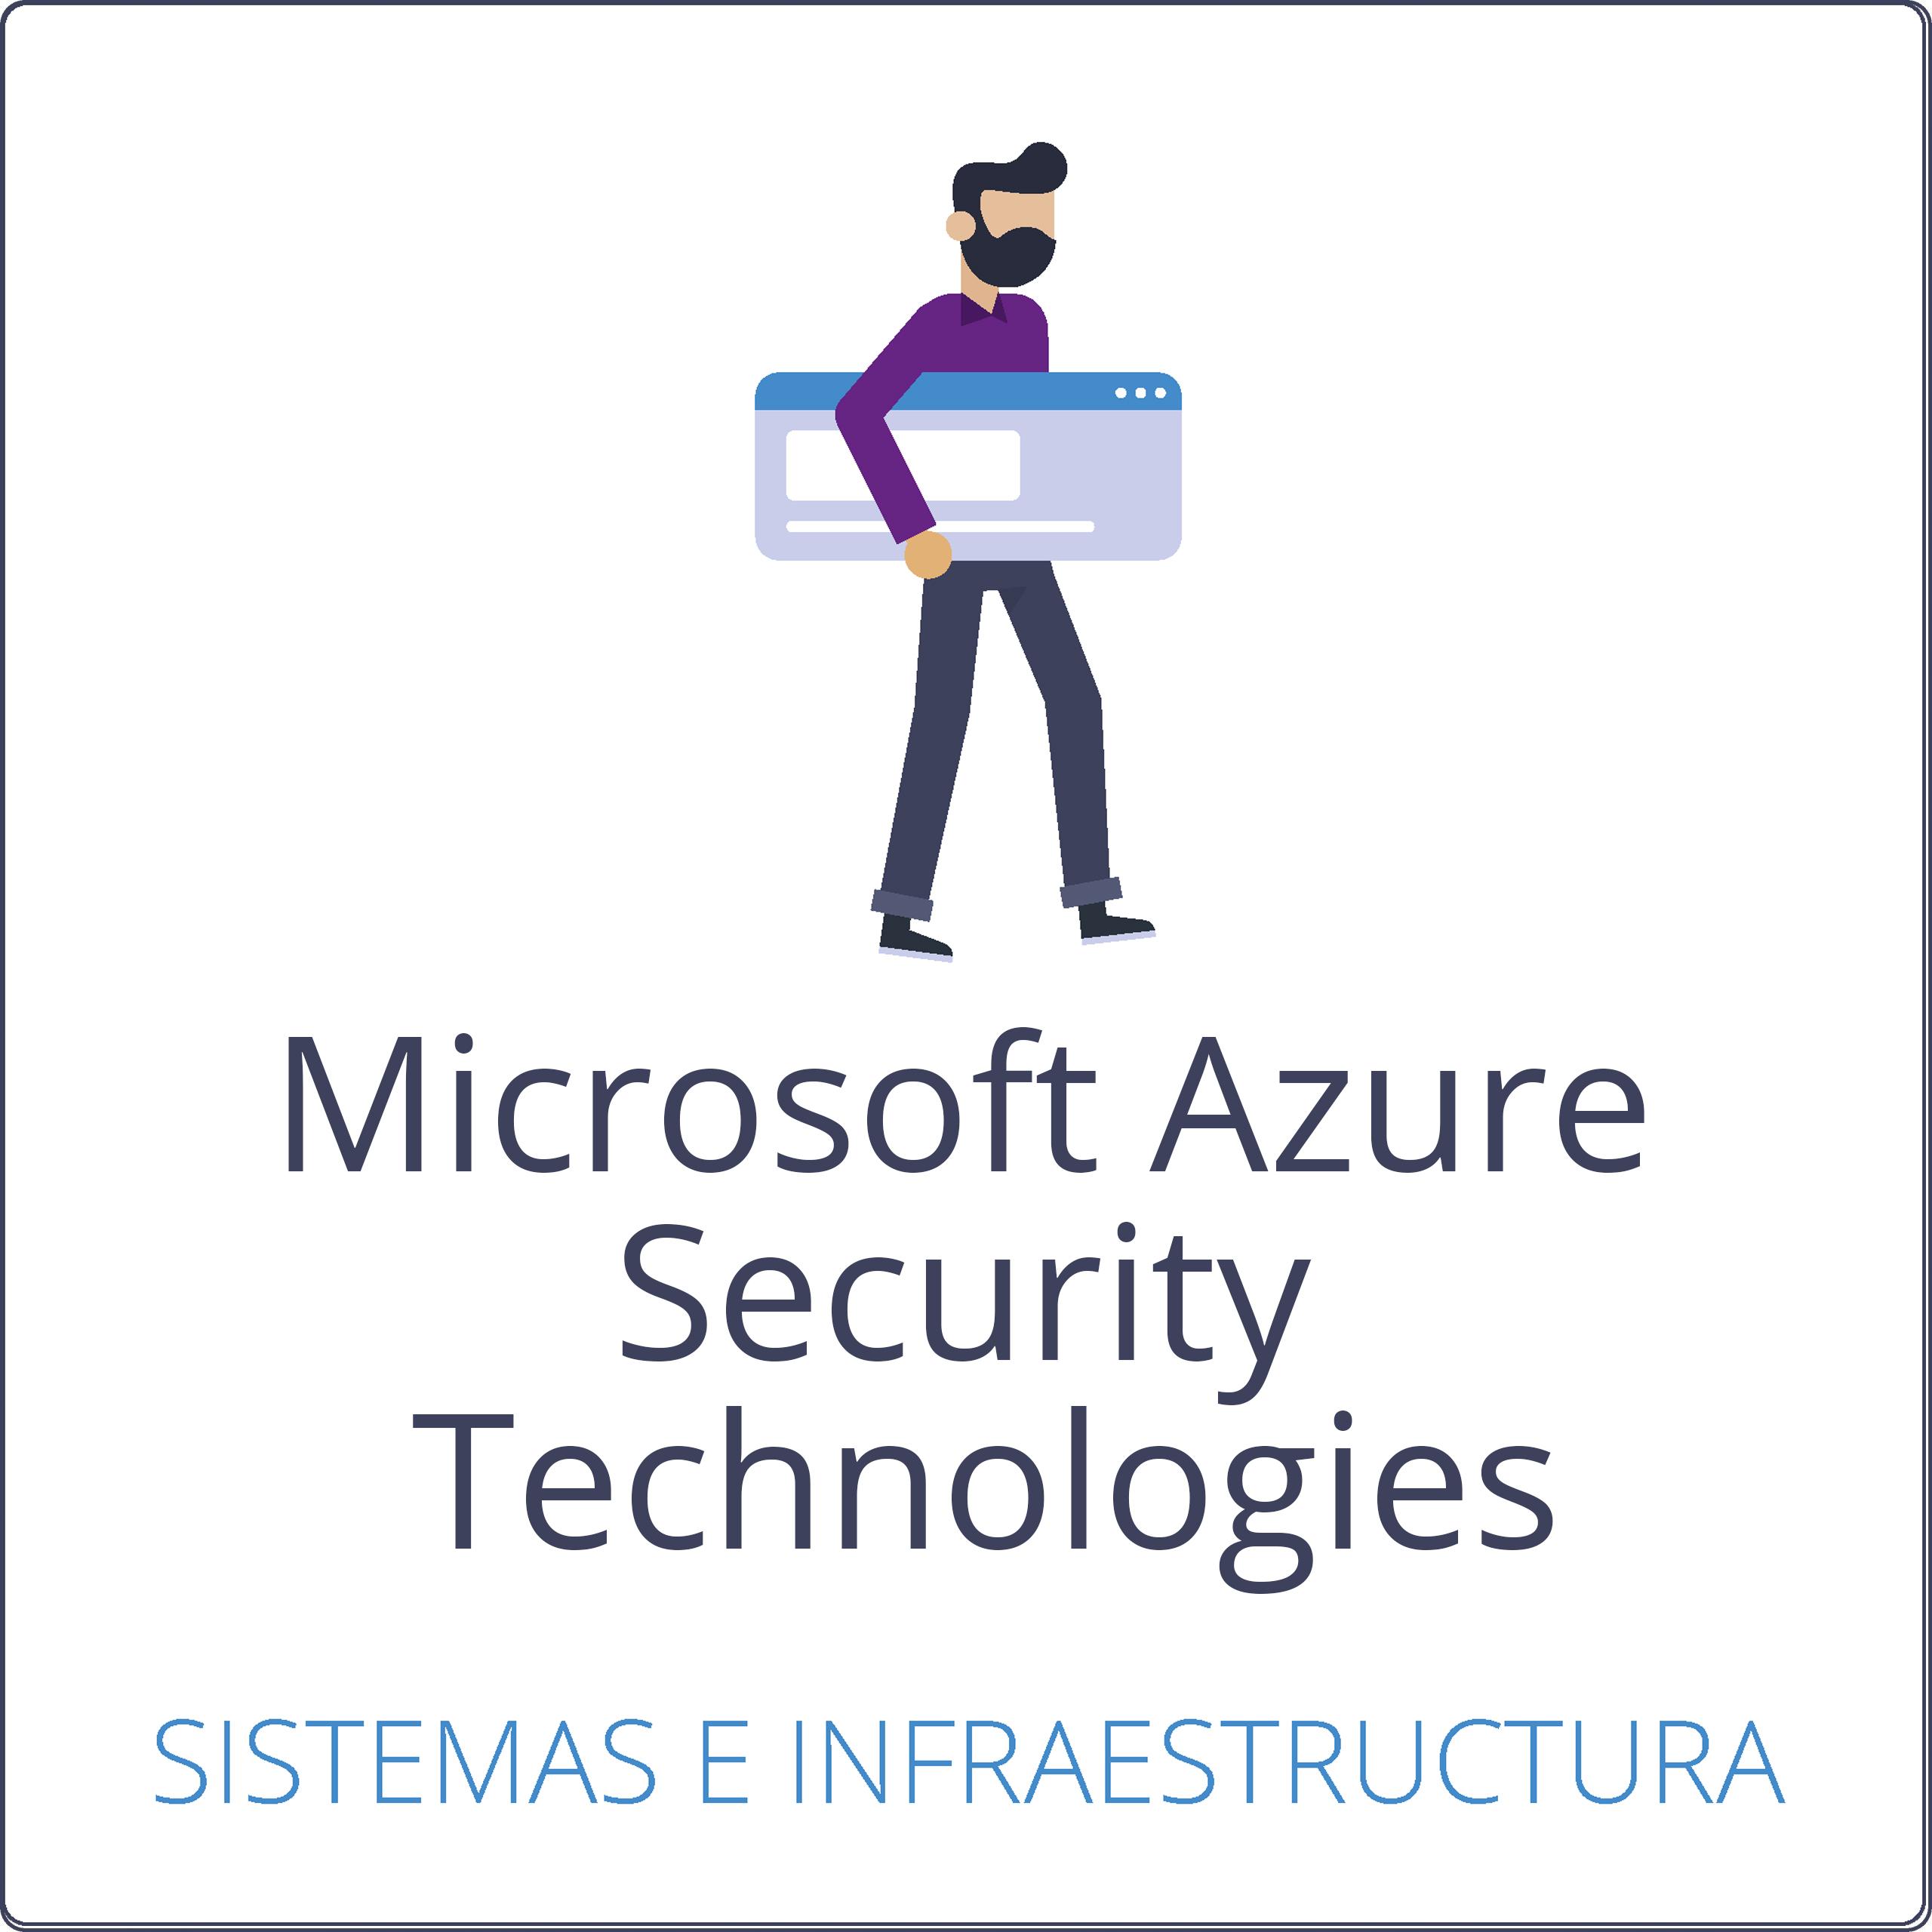 Microsoft Azure Security Technologies